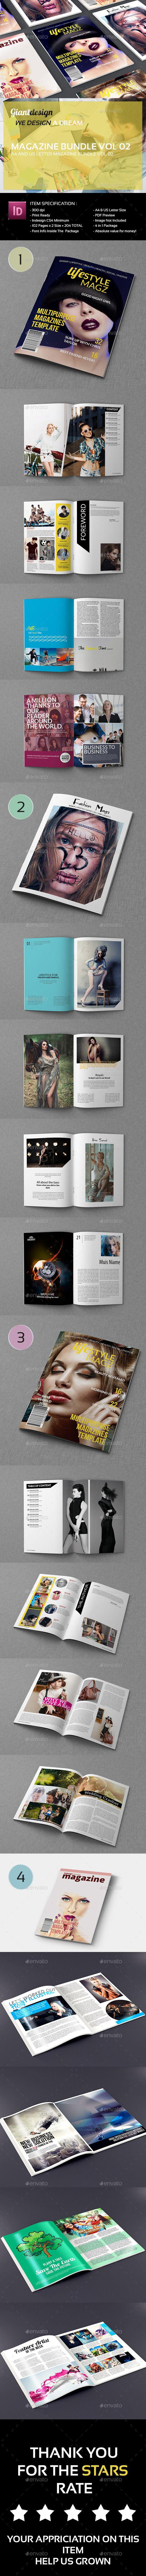 Magazine Bundle Template | #magazinetemplate #magazinedesign | Download: http://graphicriver.net/item/magazine-bundle-vol-02/10288103?ref=ksioks